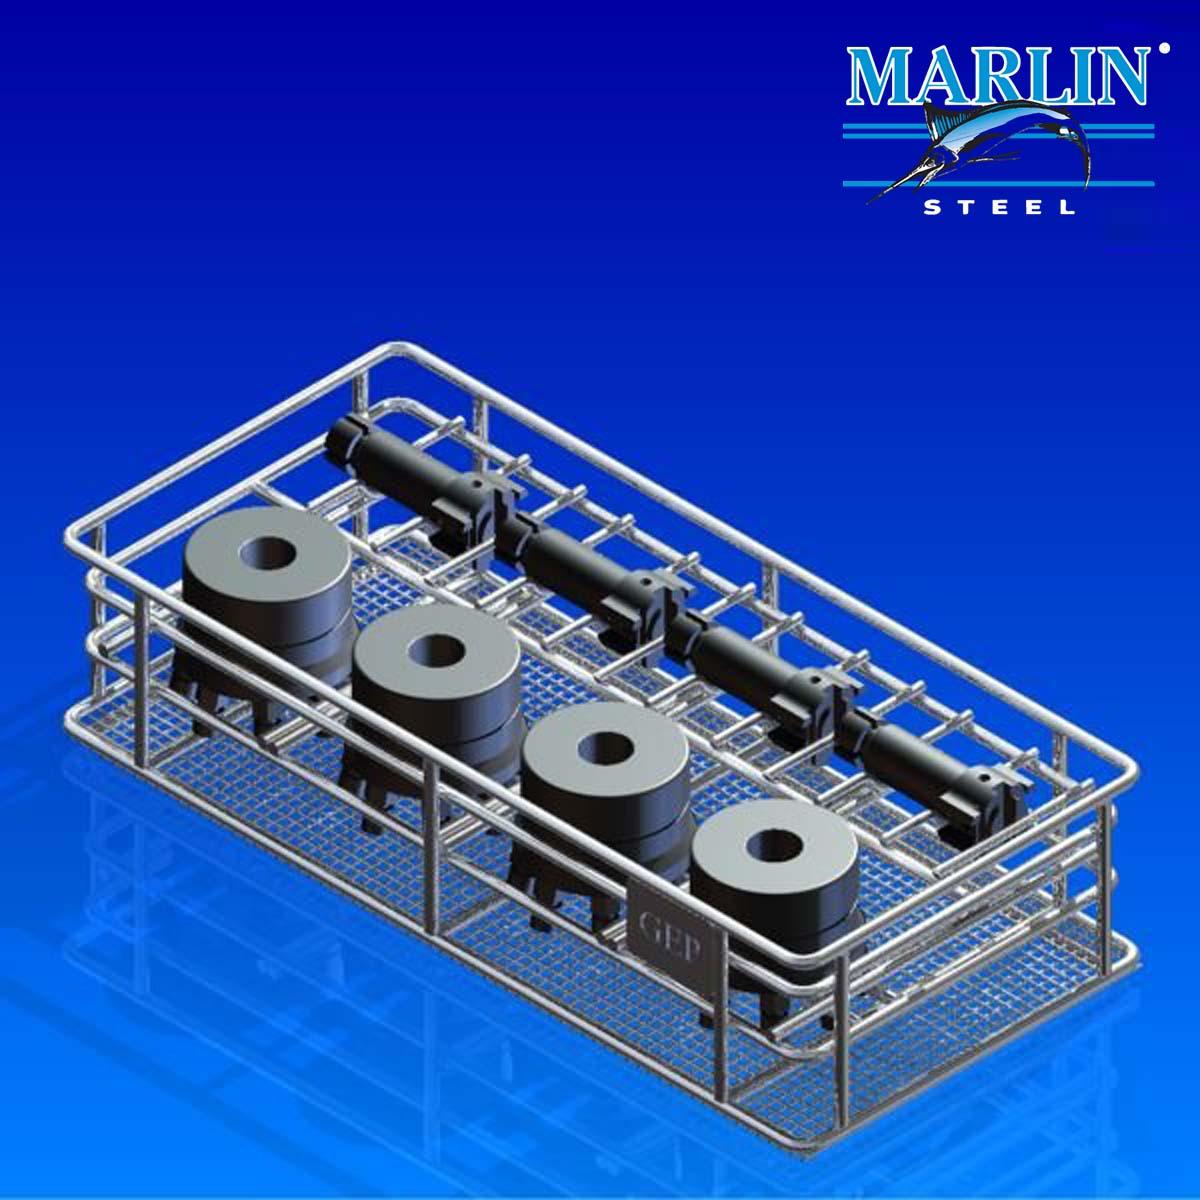 Ultrasonic Cleaning Basket 1183001